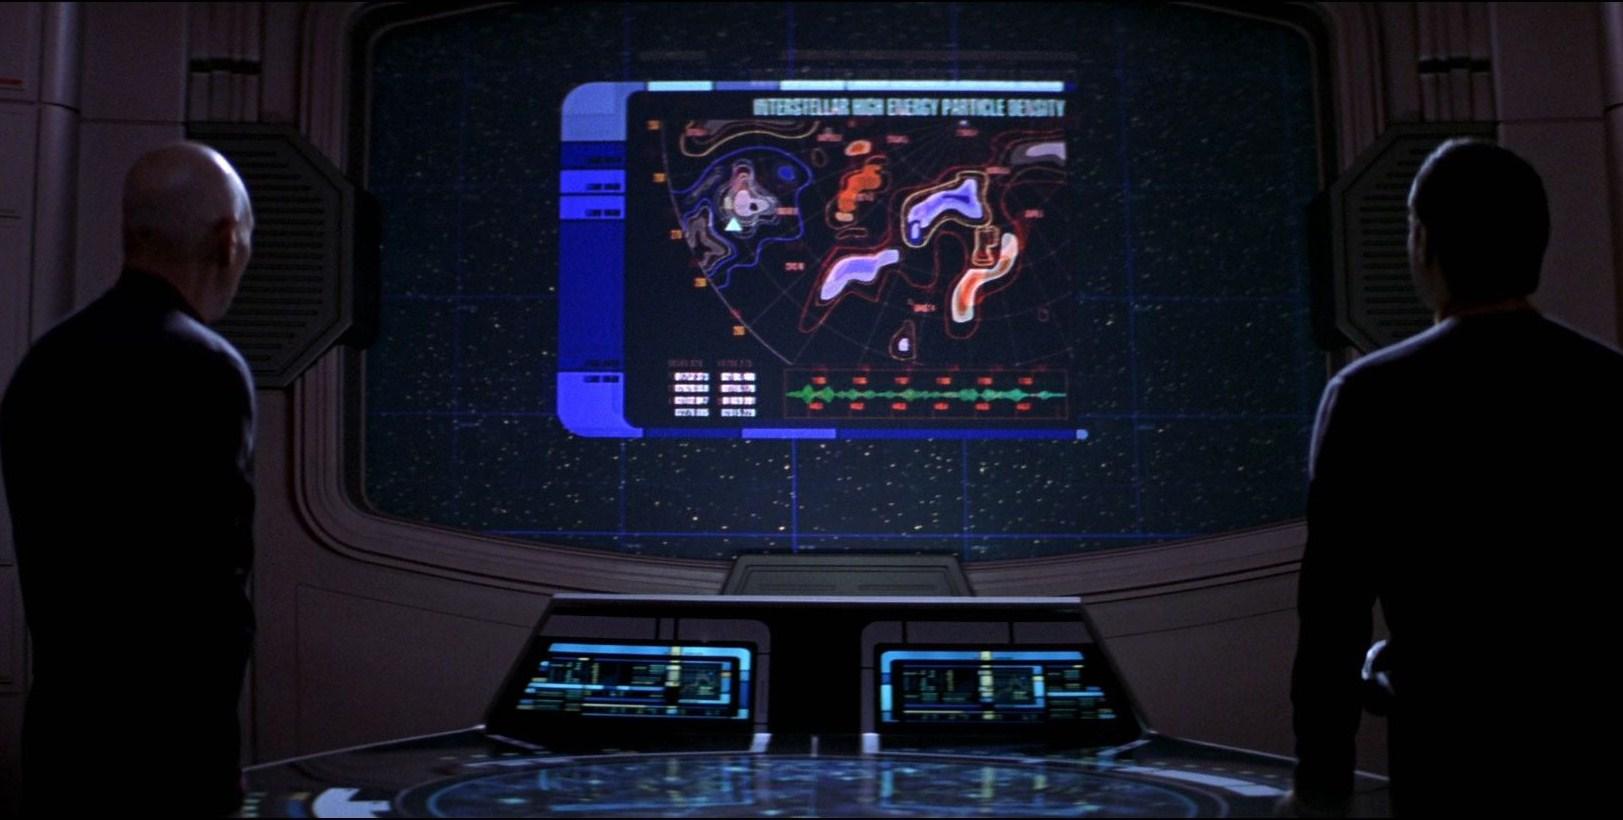 Starfleet Cartography